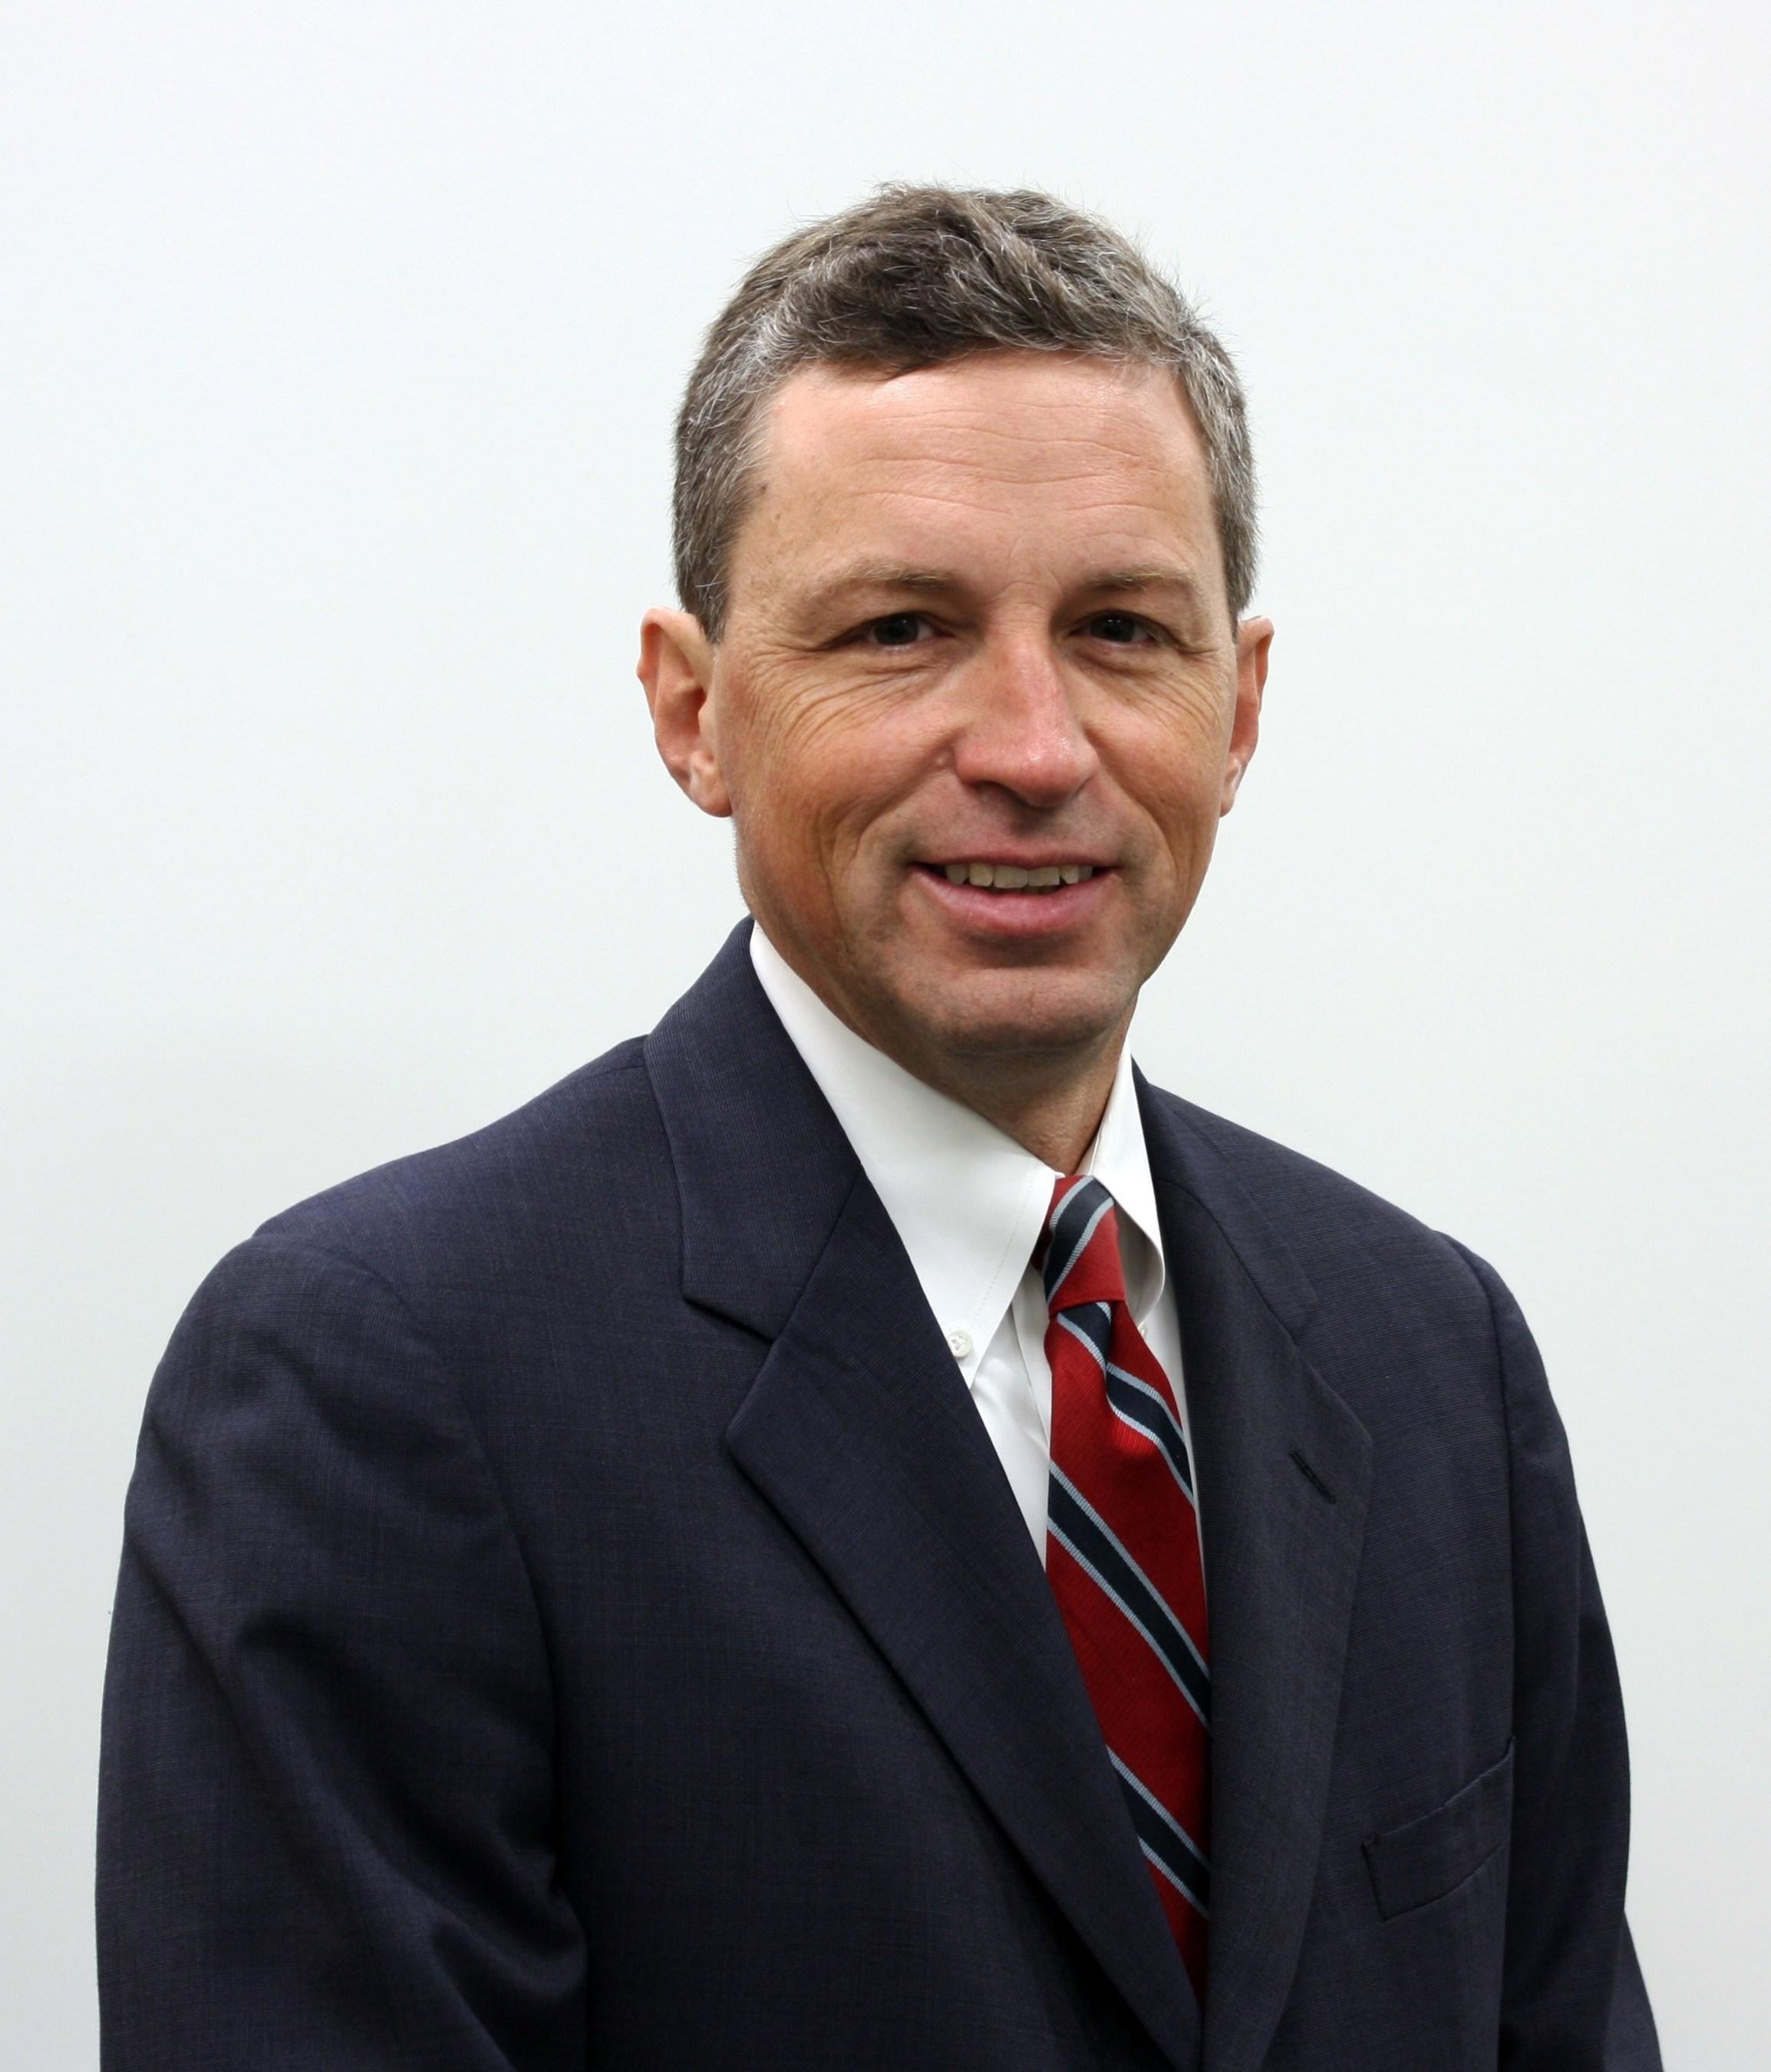 Robert (Bob) J. Keller to join Vista Outdoor Inc. as President, Shooting Sports.